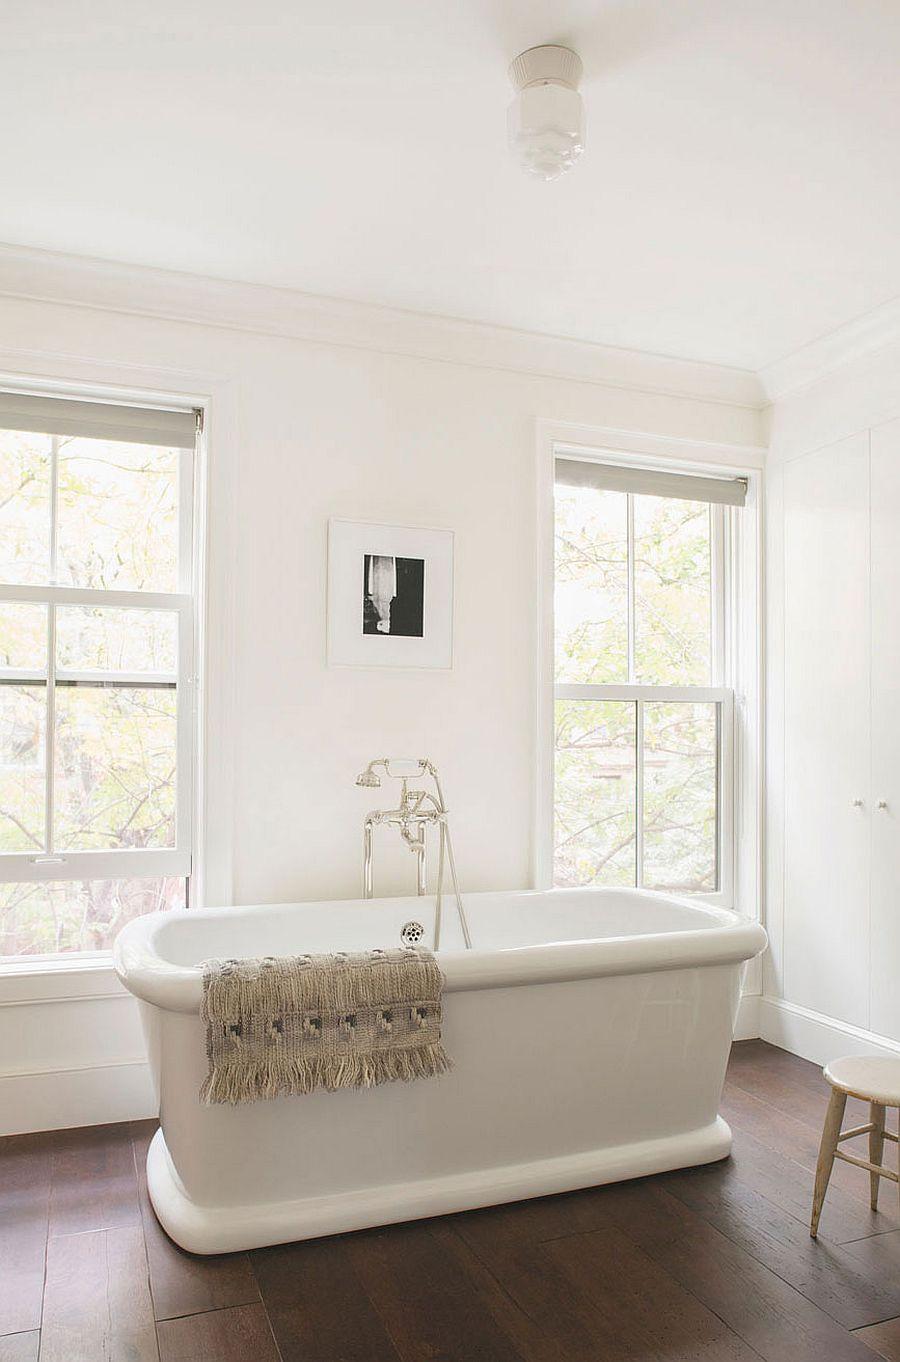 Bathtub in white creates a relaxing, all-white bathroom